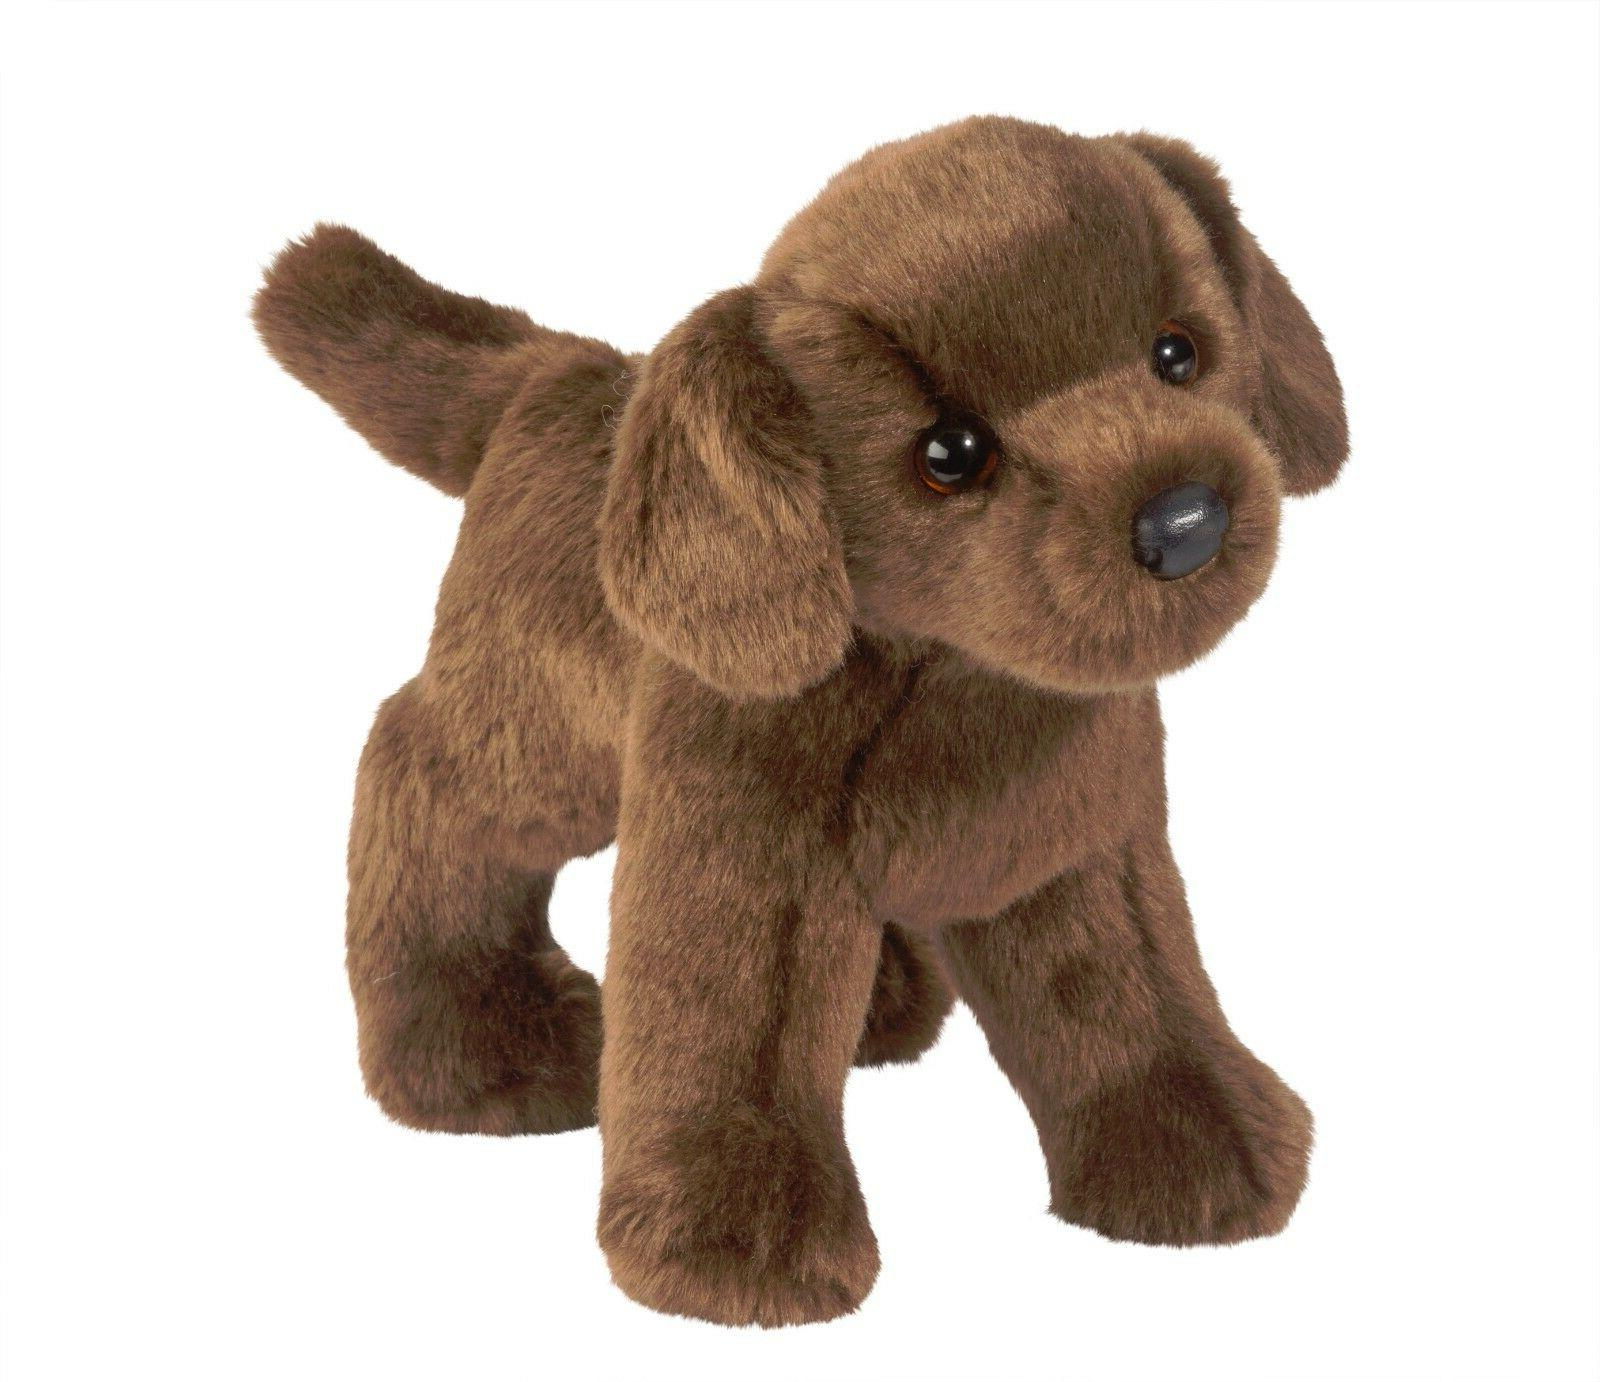 king 16 plush golden retriever stuffed animal